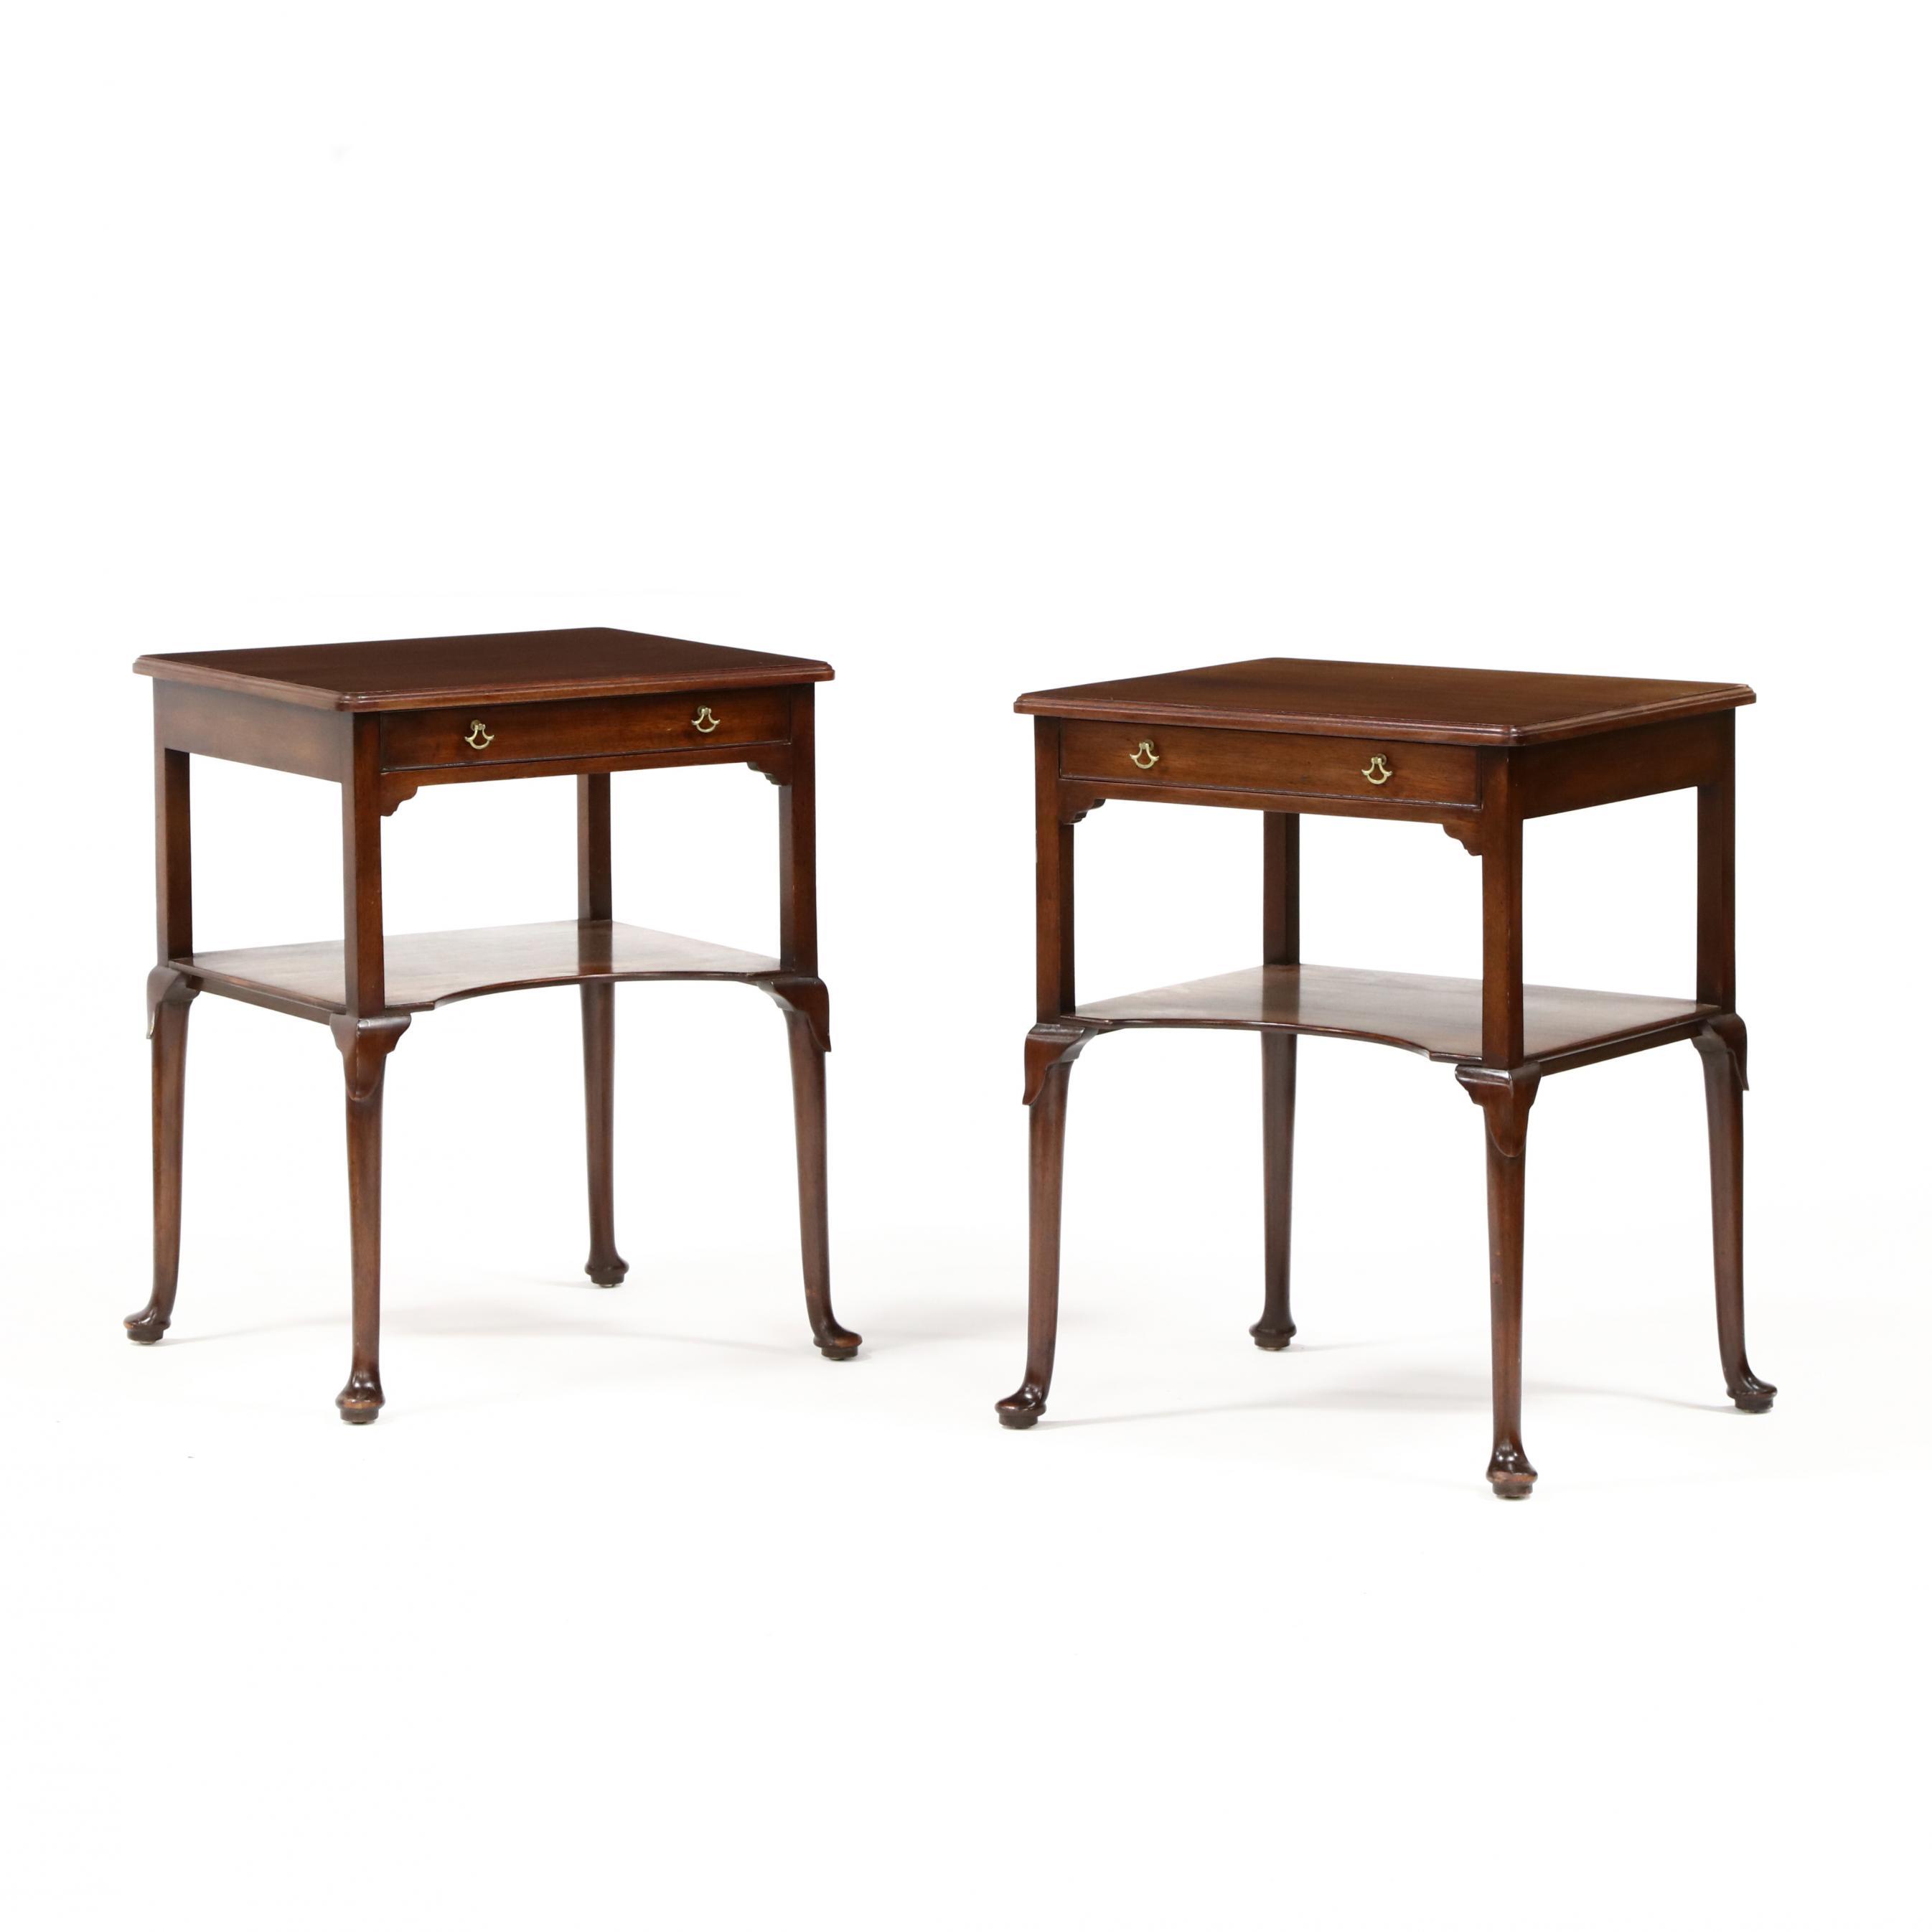 edward-garratt-pair-of-georgian-style-mahogany-one-drawer-stands